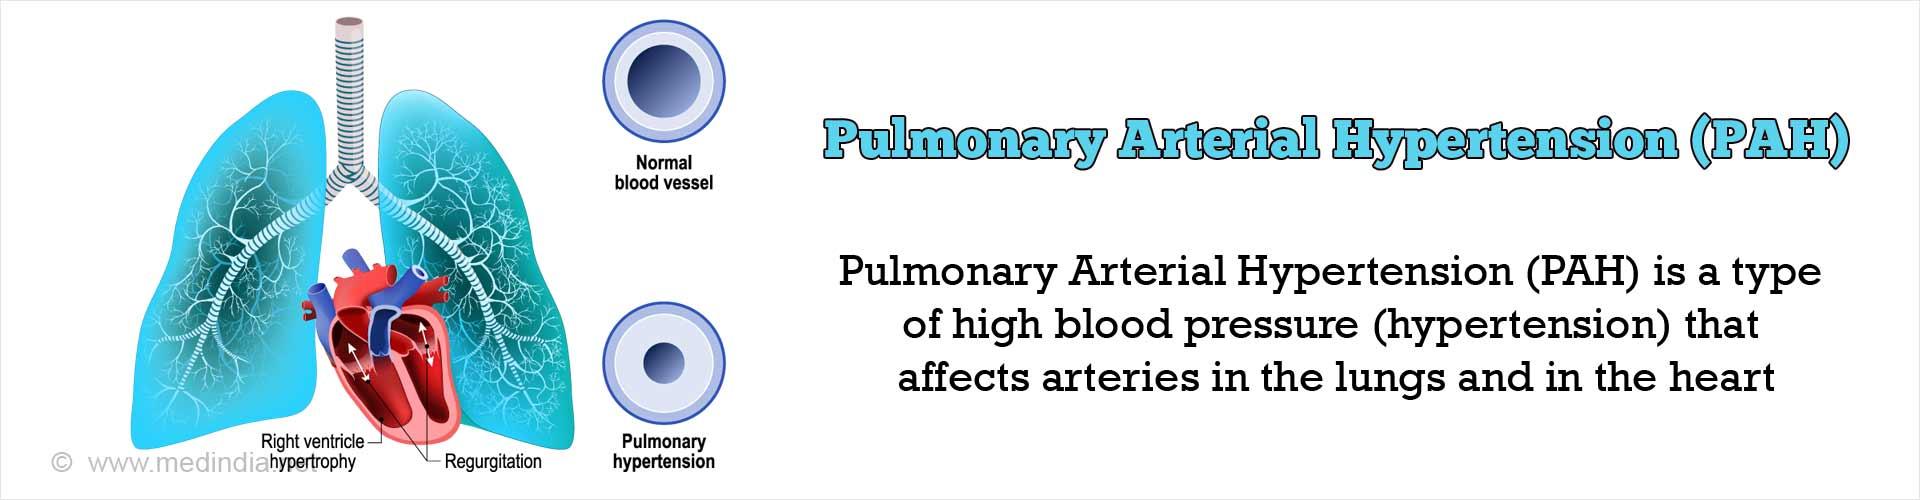 Pulmonary Arterial Hypertension [PAH] - Symptoms & Signs - Causes - Diagnosis -